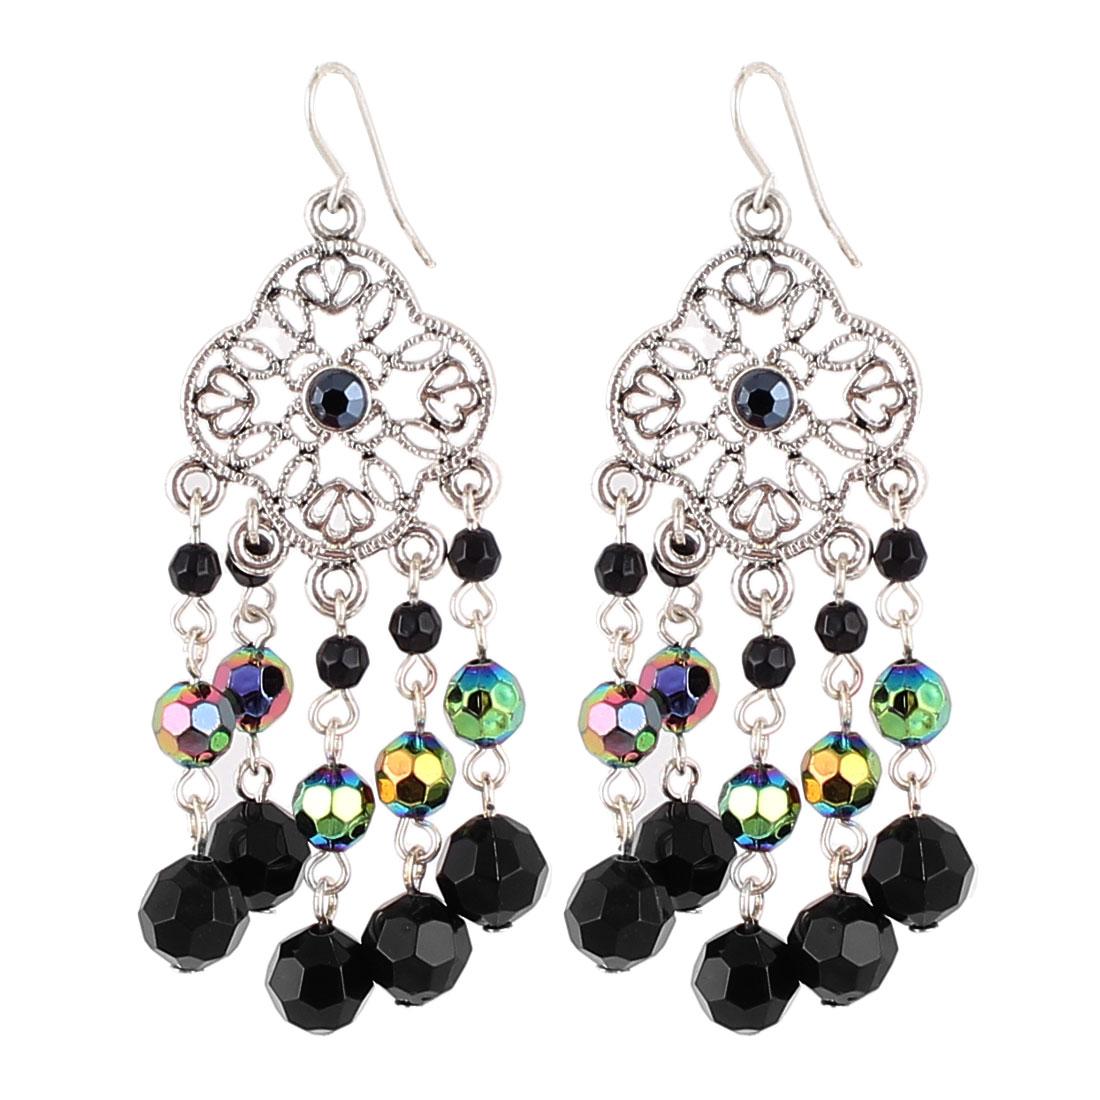 "2"" Length Silver Tone Black Plastic Beads Pendant Vintage Style Metal Fish Hook Earrings Earbob Pair for Lady Women"